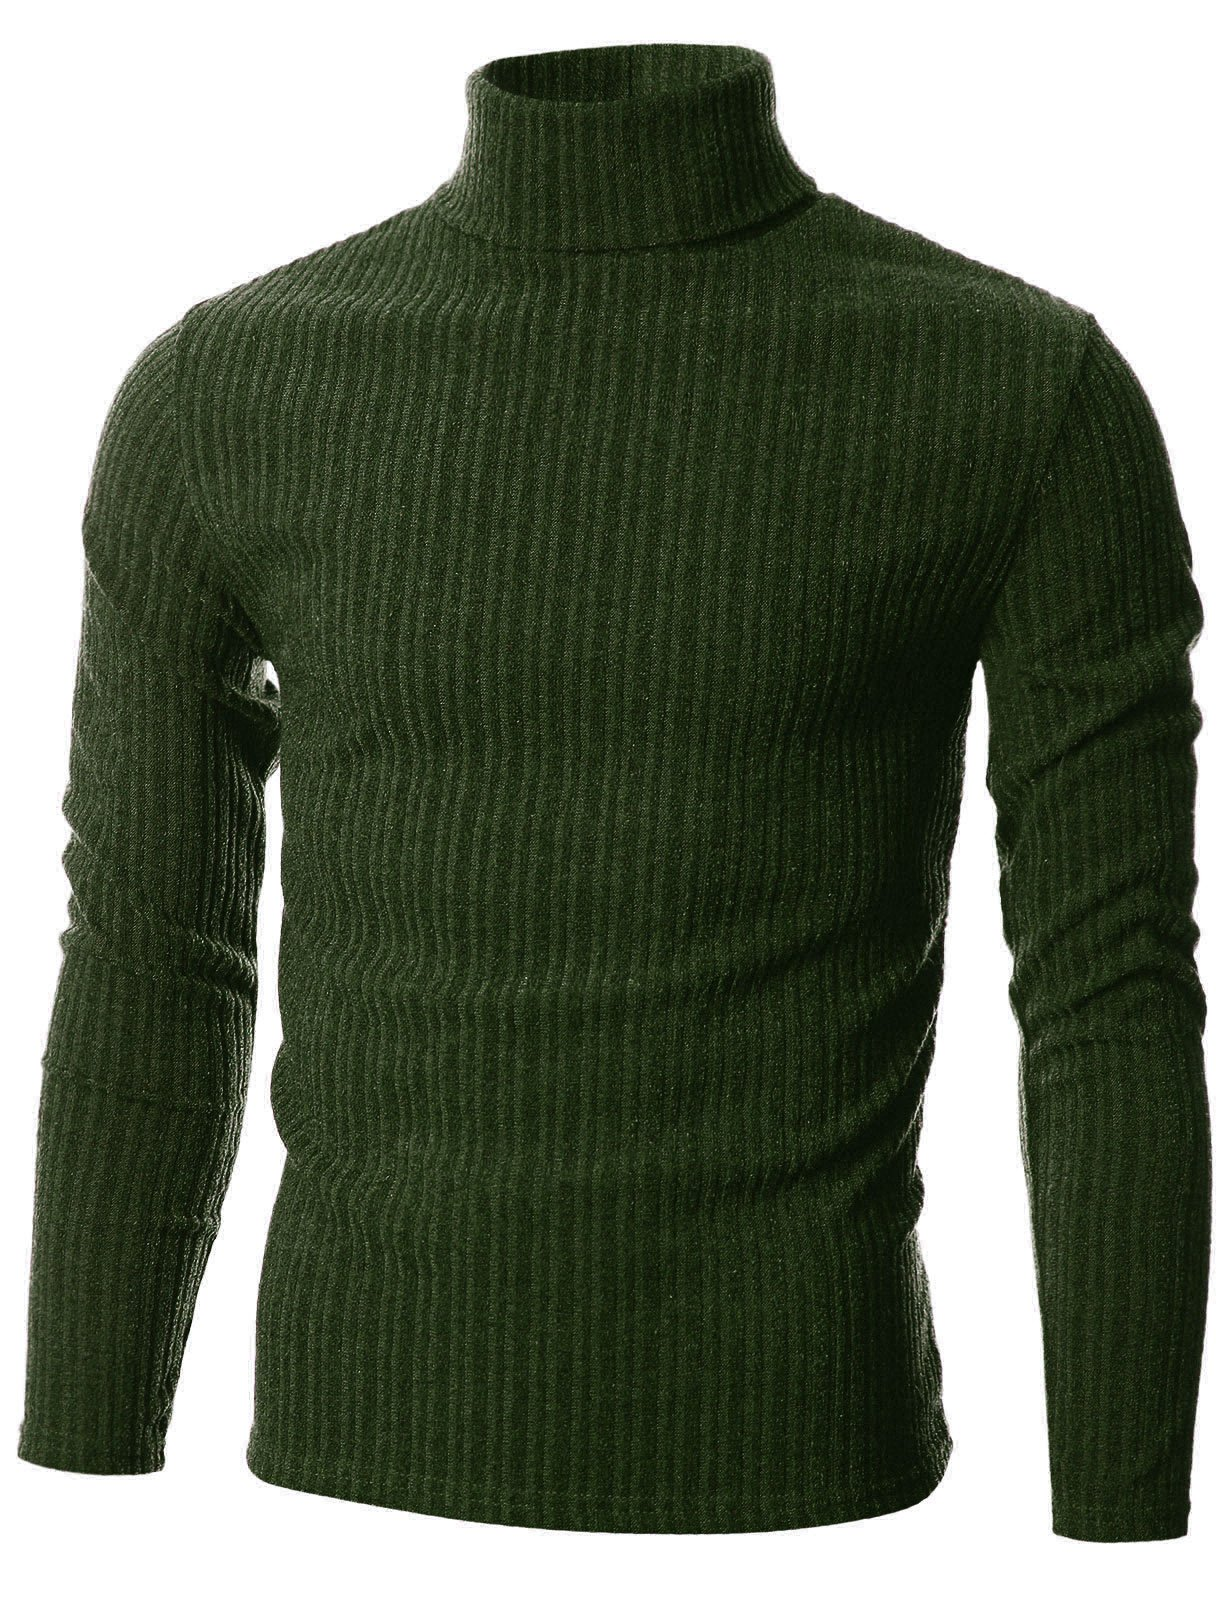 GIVON Mens Slim Fit Wide Ribbed Cotton Blend Turtleneck Pullover/DCP036-KHAKI-M